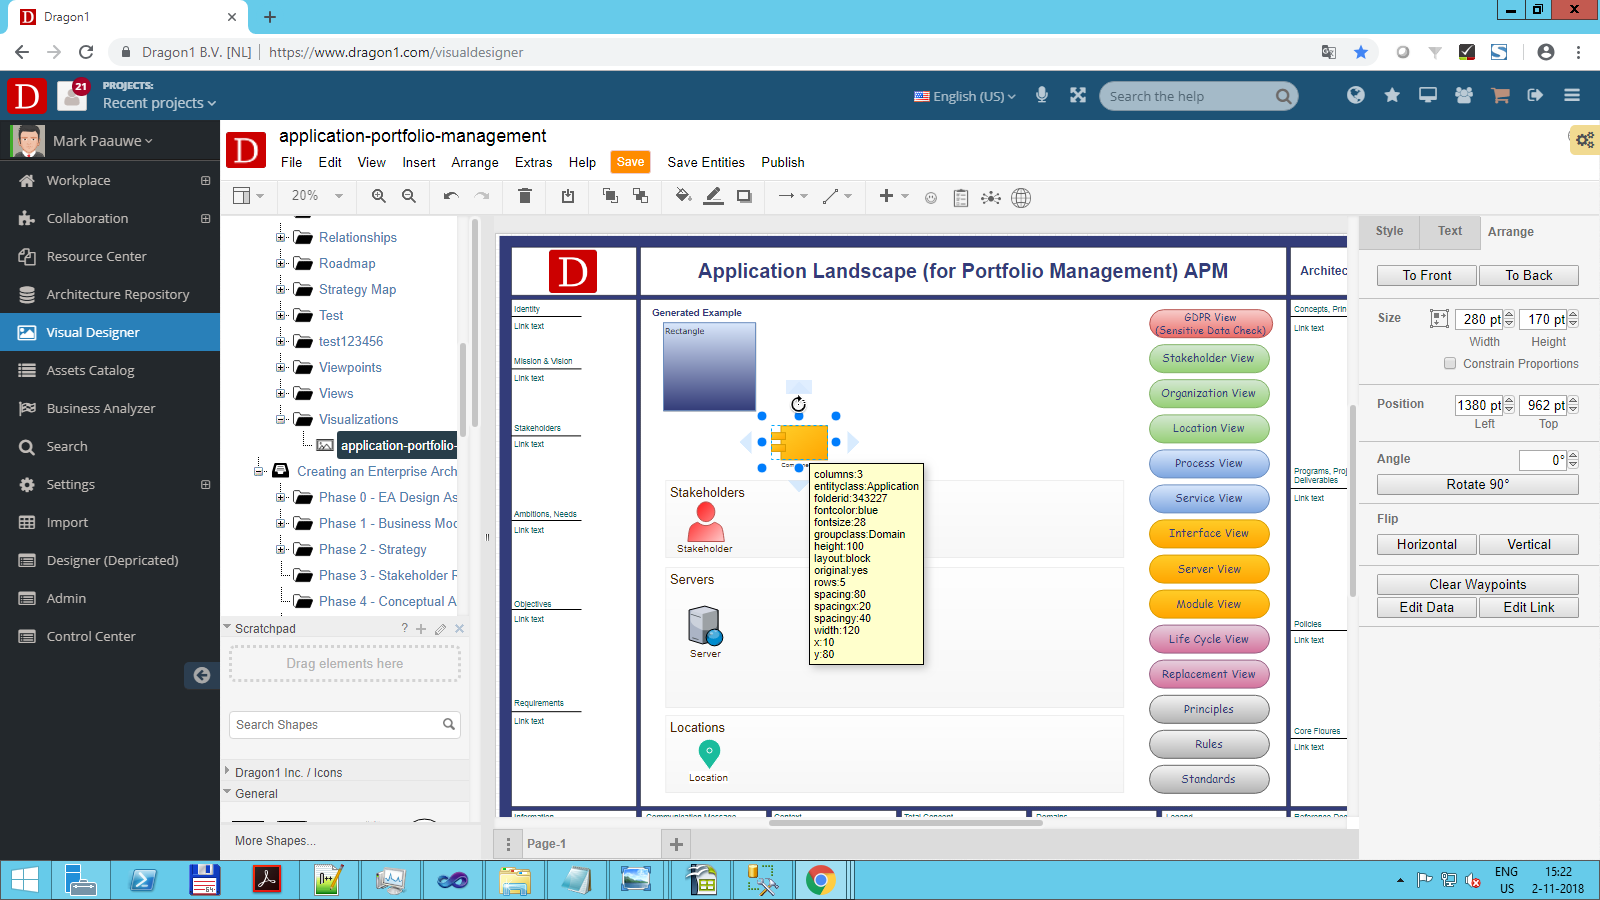 Application Portfolio Management - Dragon1